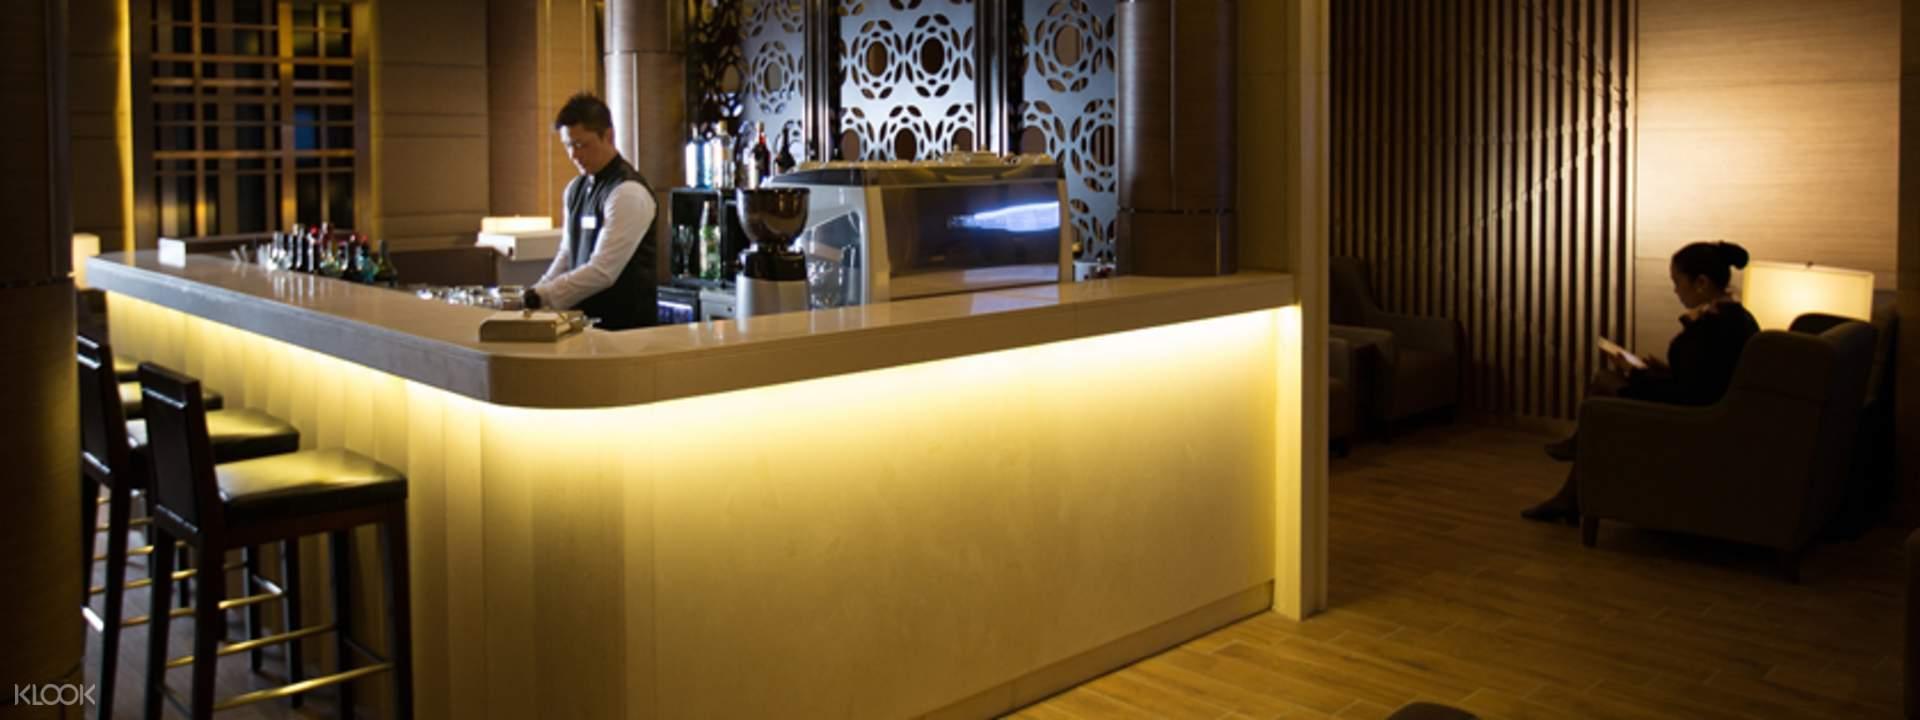 1. Al Ghazal Lounge by Plaza Premium Lounge, Terminal 2, Abu Dhabi International Airport — 21.45 (28.76) forecasting